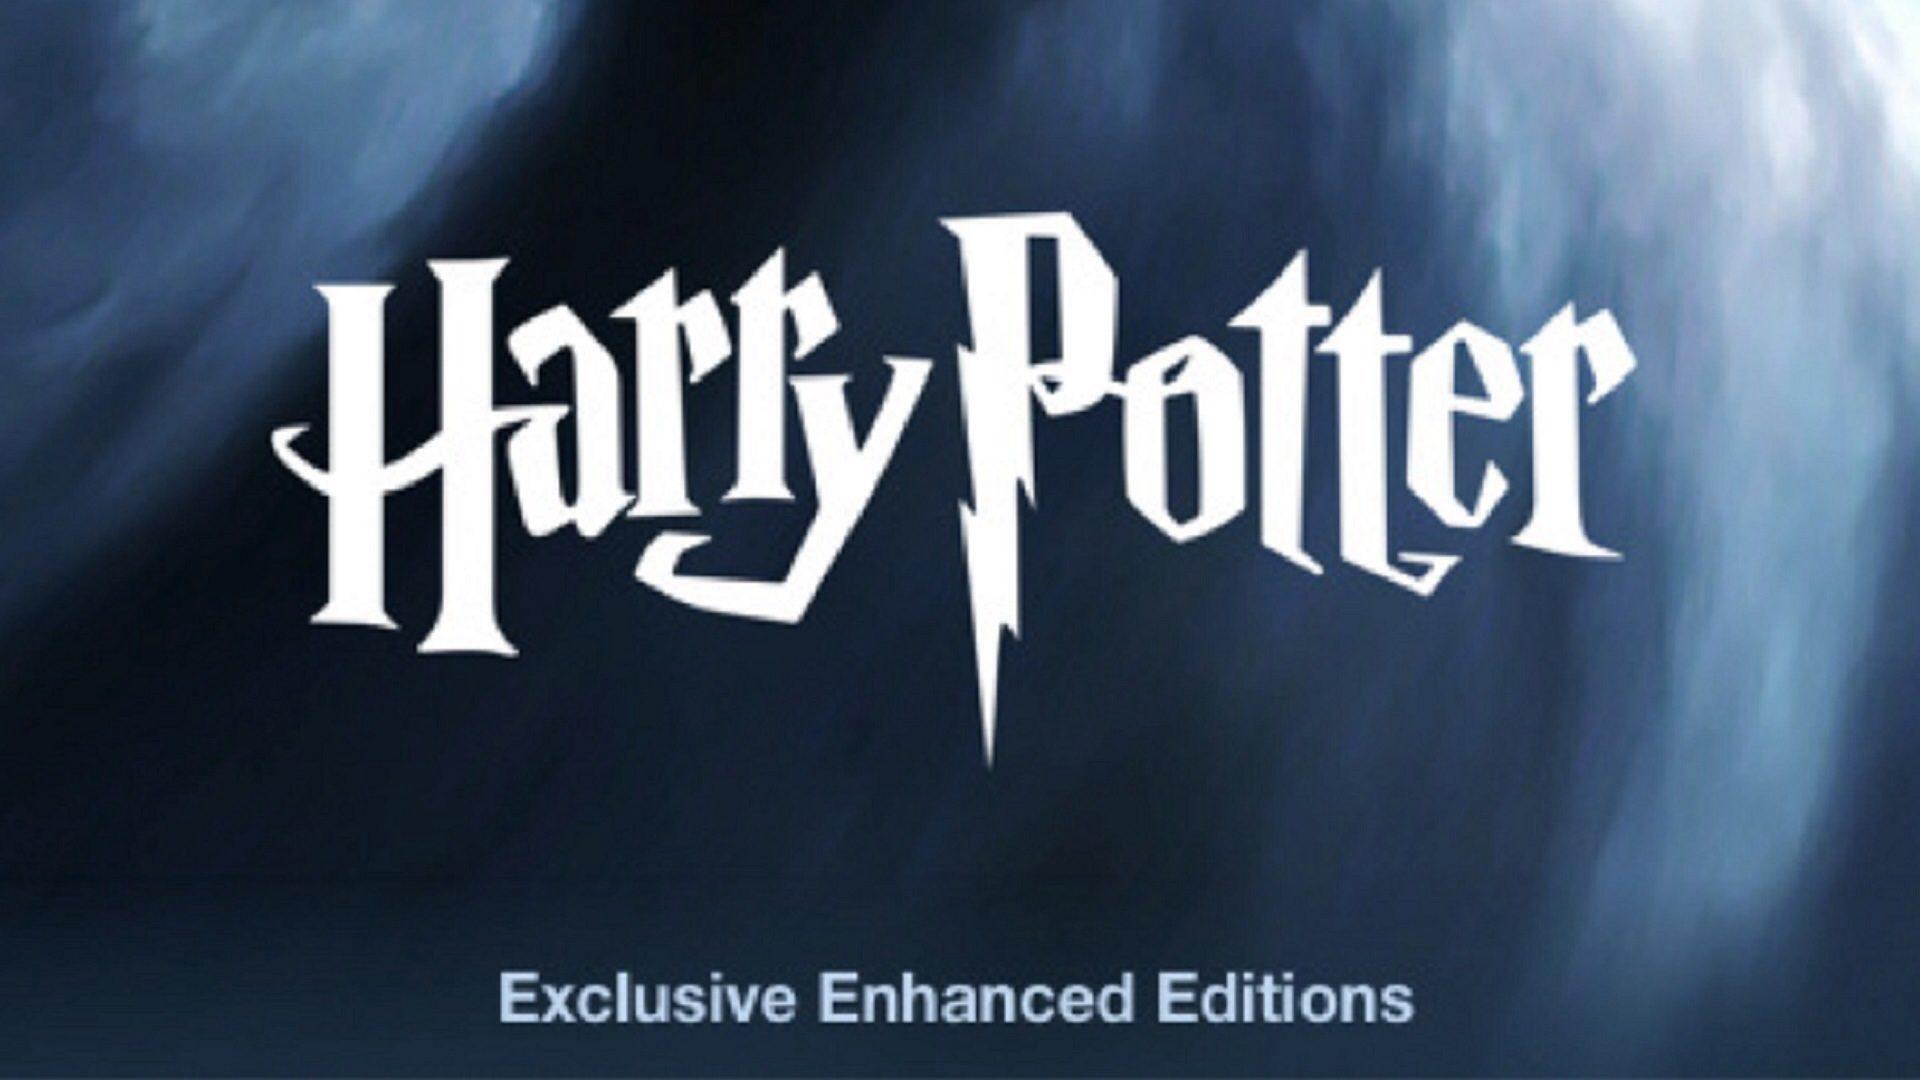 Amazing Wallpaper Harry Potter Ipad - harry-potter-ibooks  Image_246371.jpg